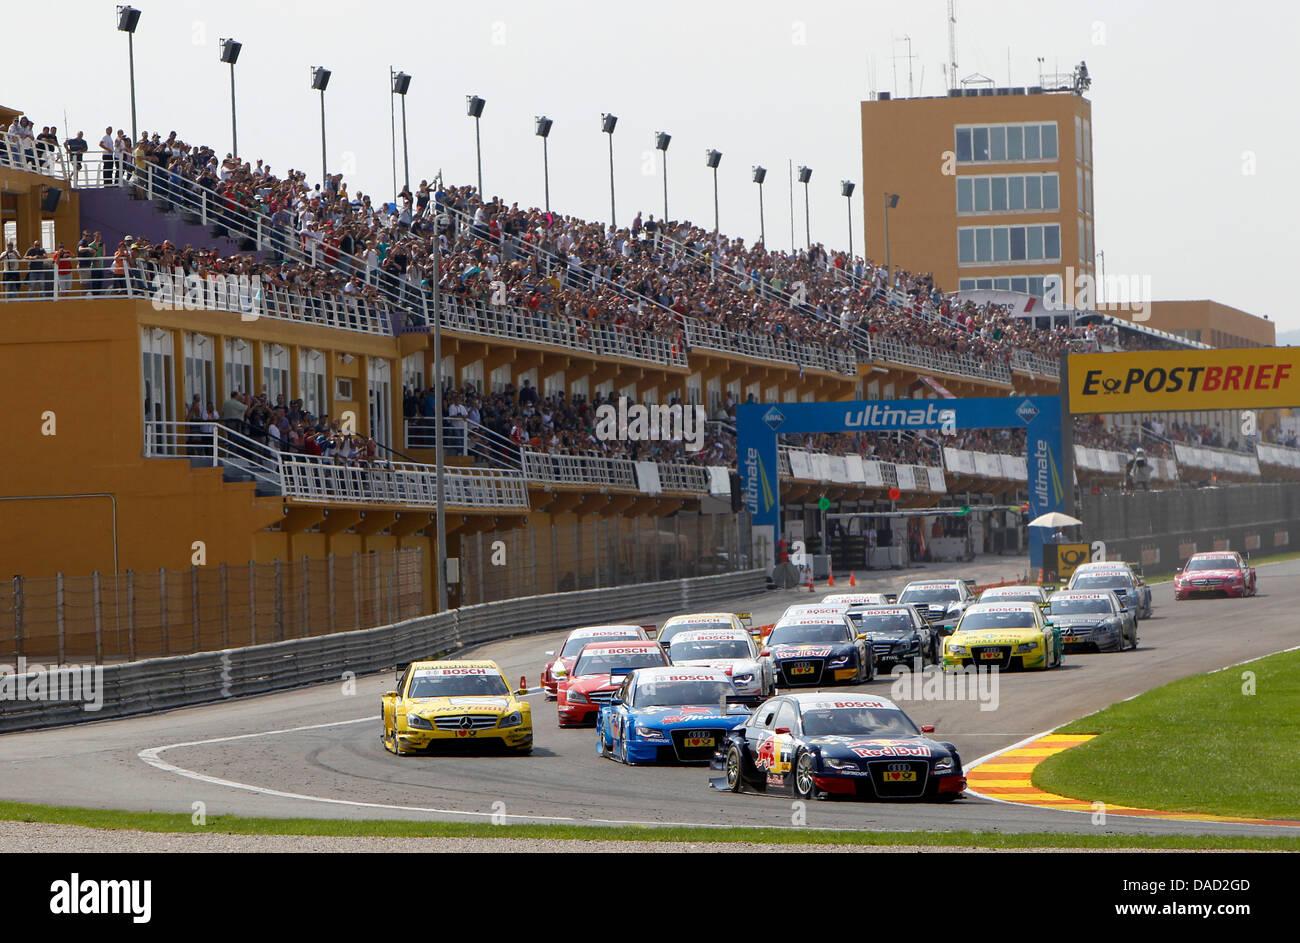 Swedish DTM-driver Mattias Ekstroem of Audi Sport Team Abt Sportsline is ahead during the German Touring Car Masters - Stock Image